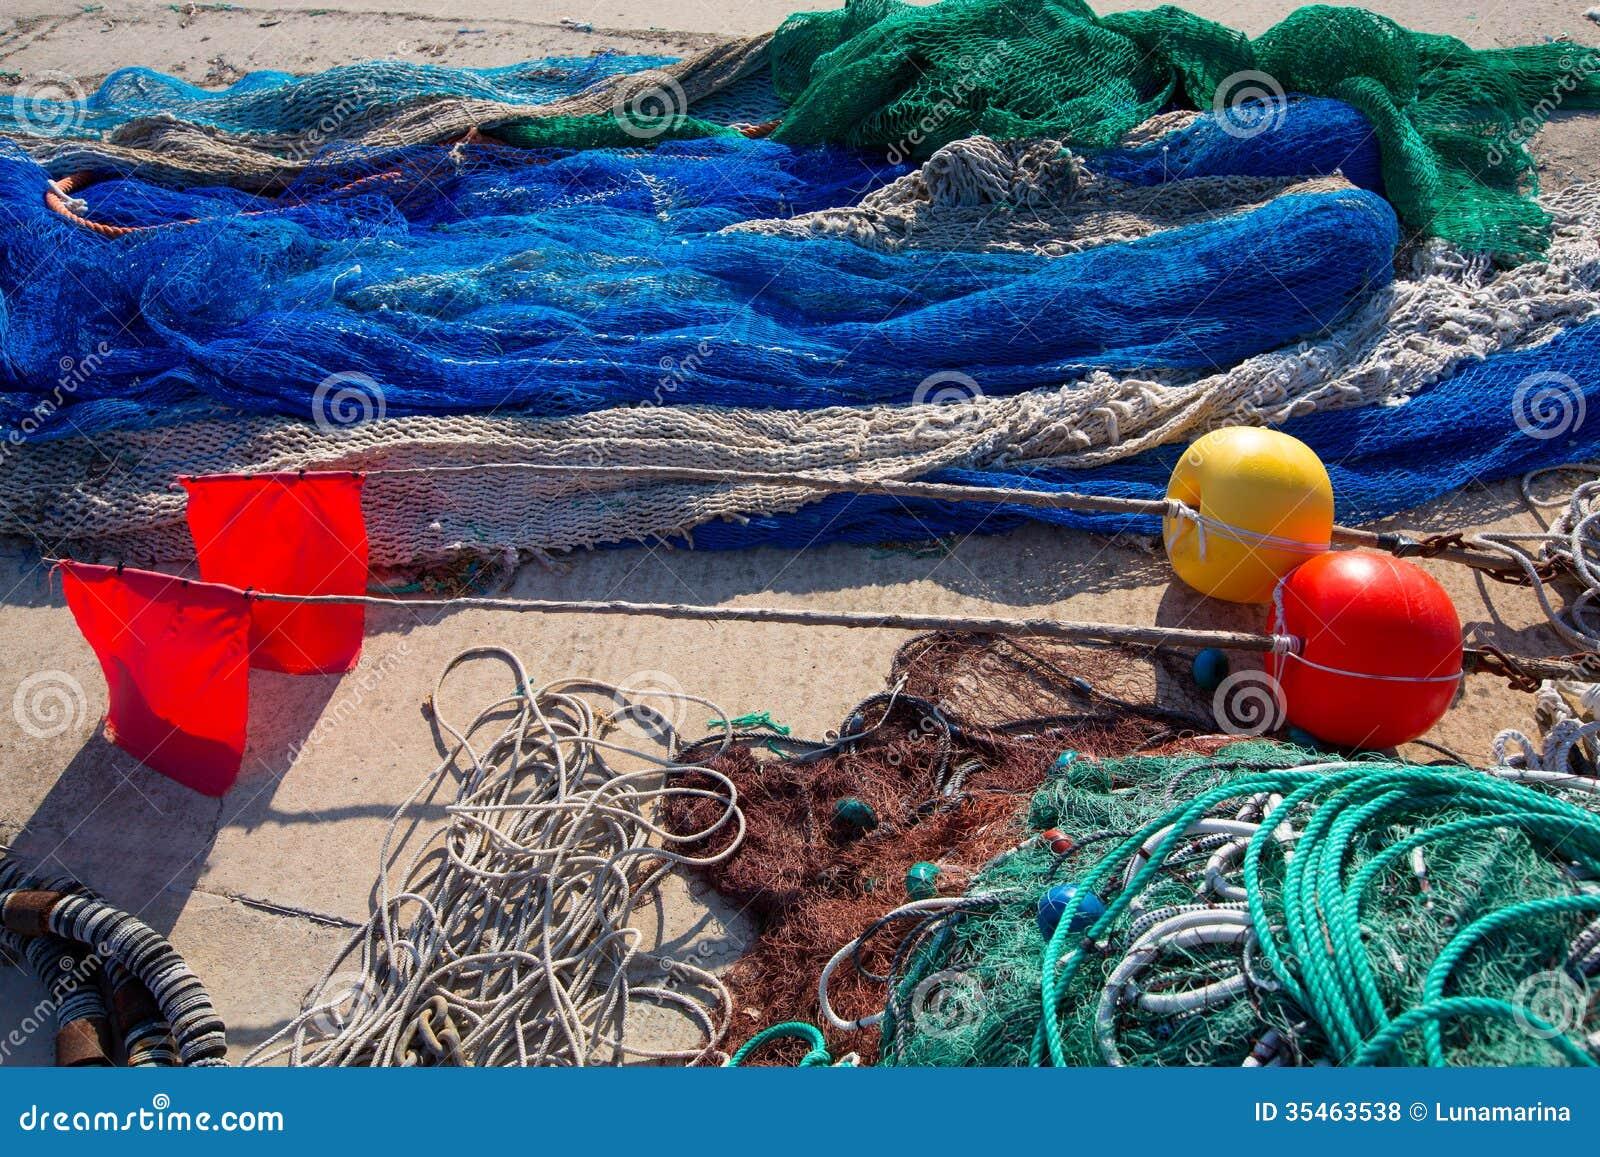 Formentera balearic islands fishing tackle nets longliner for Island fishing tackle